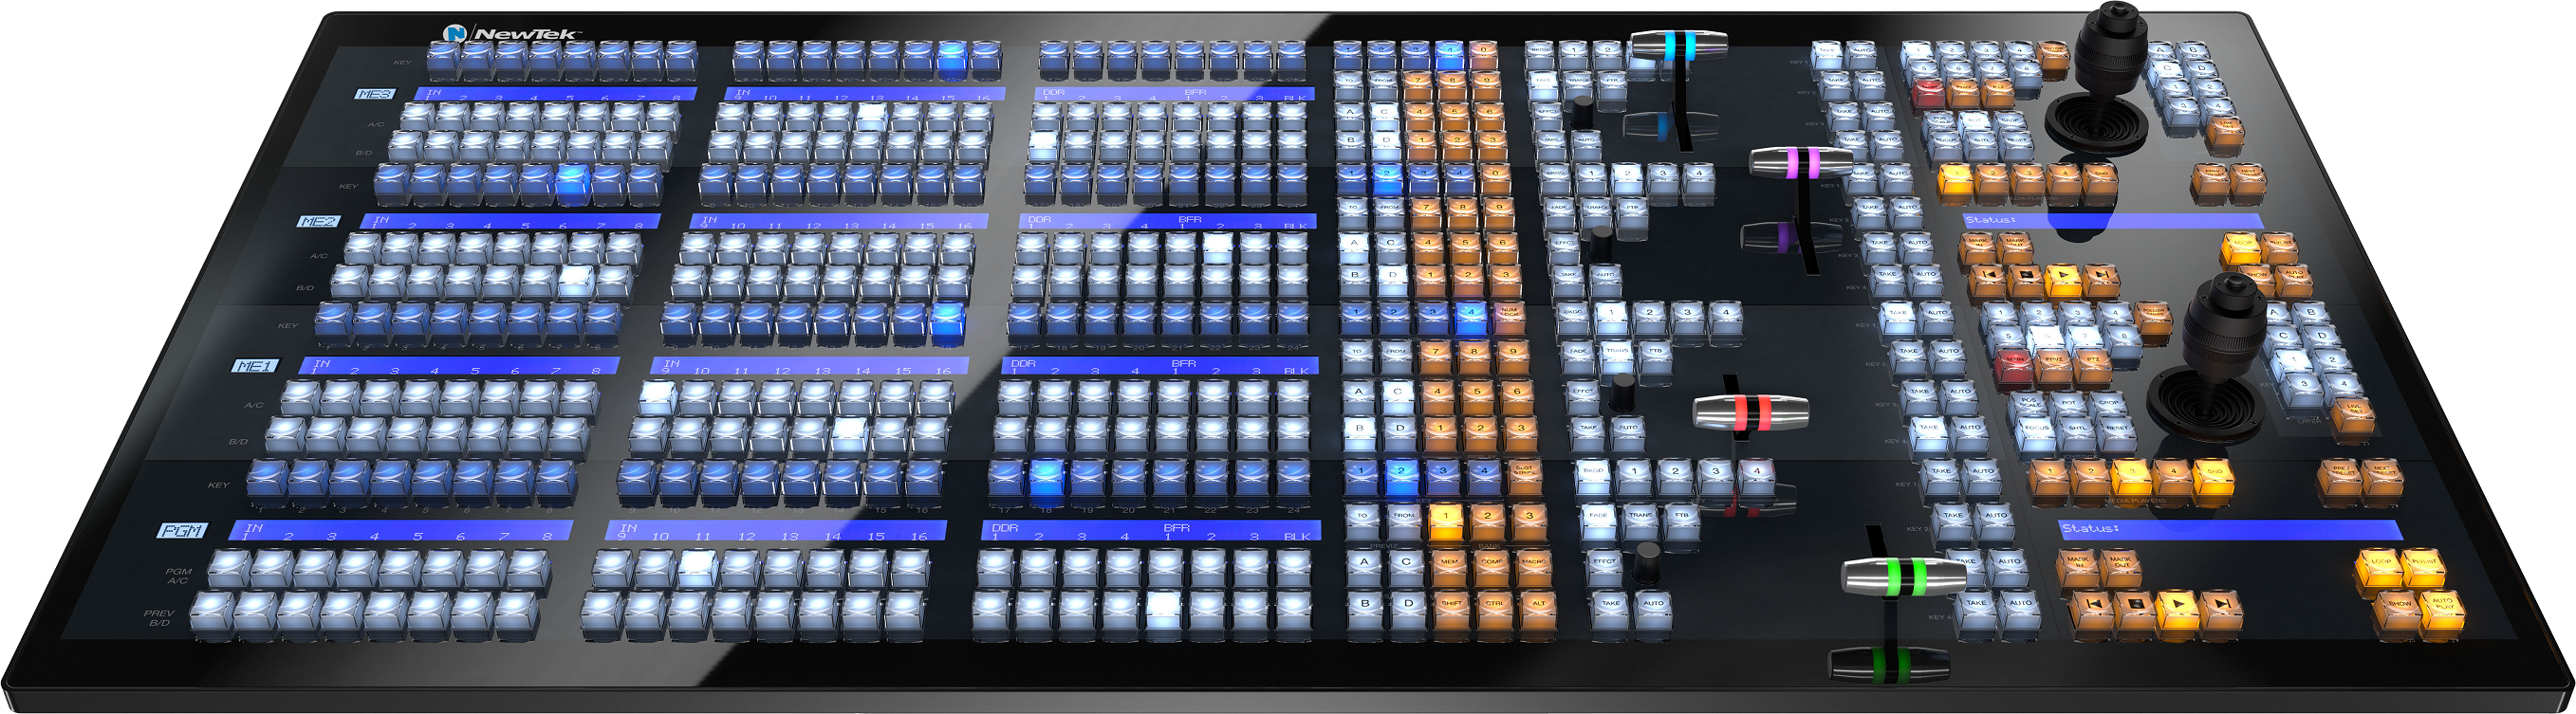 4 Stripe Control Panel